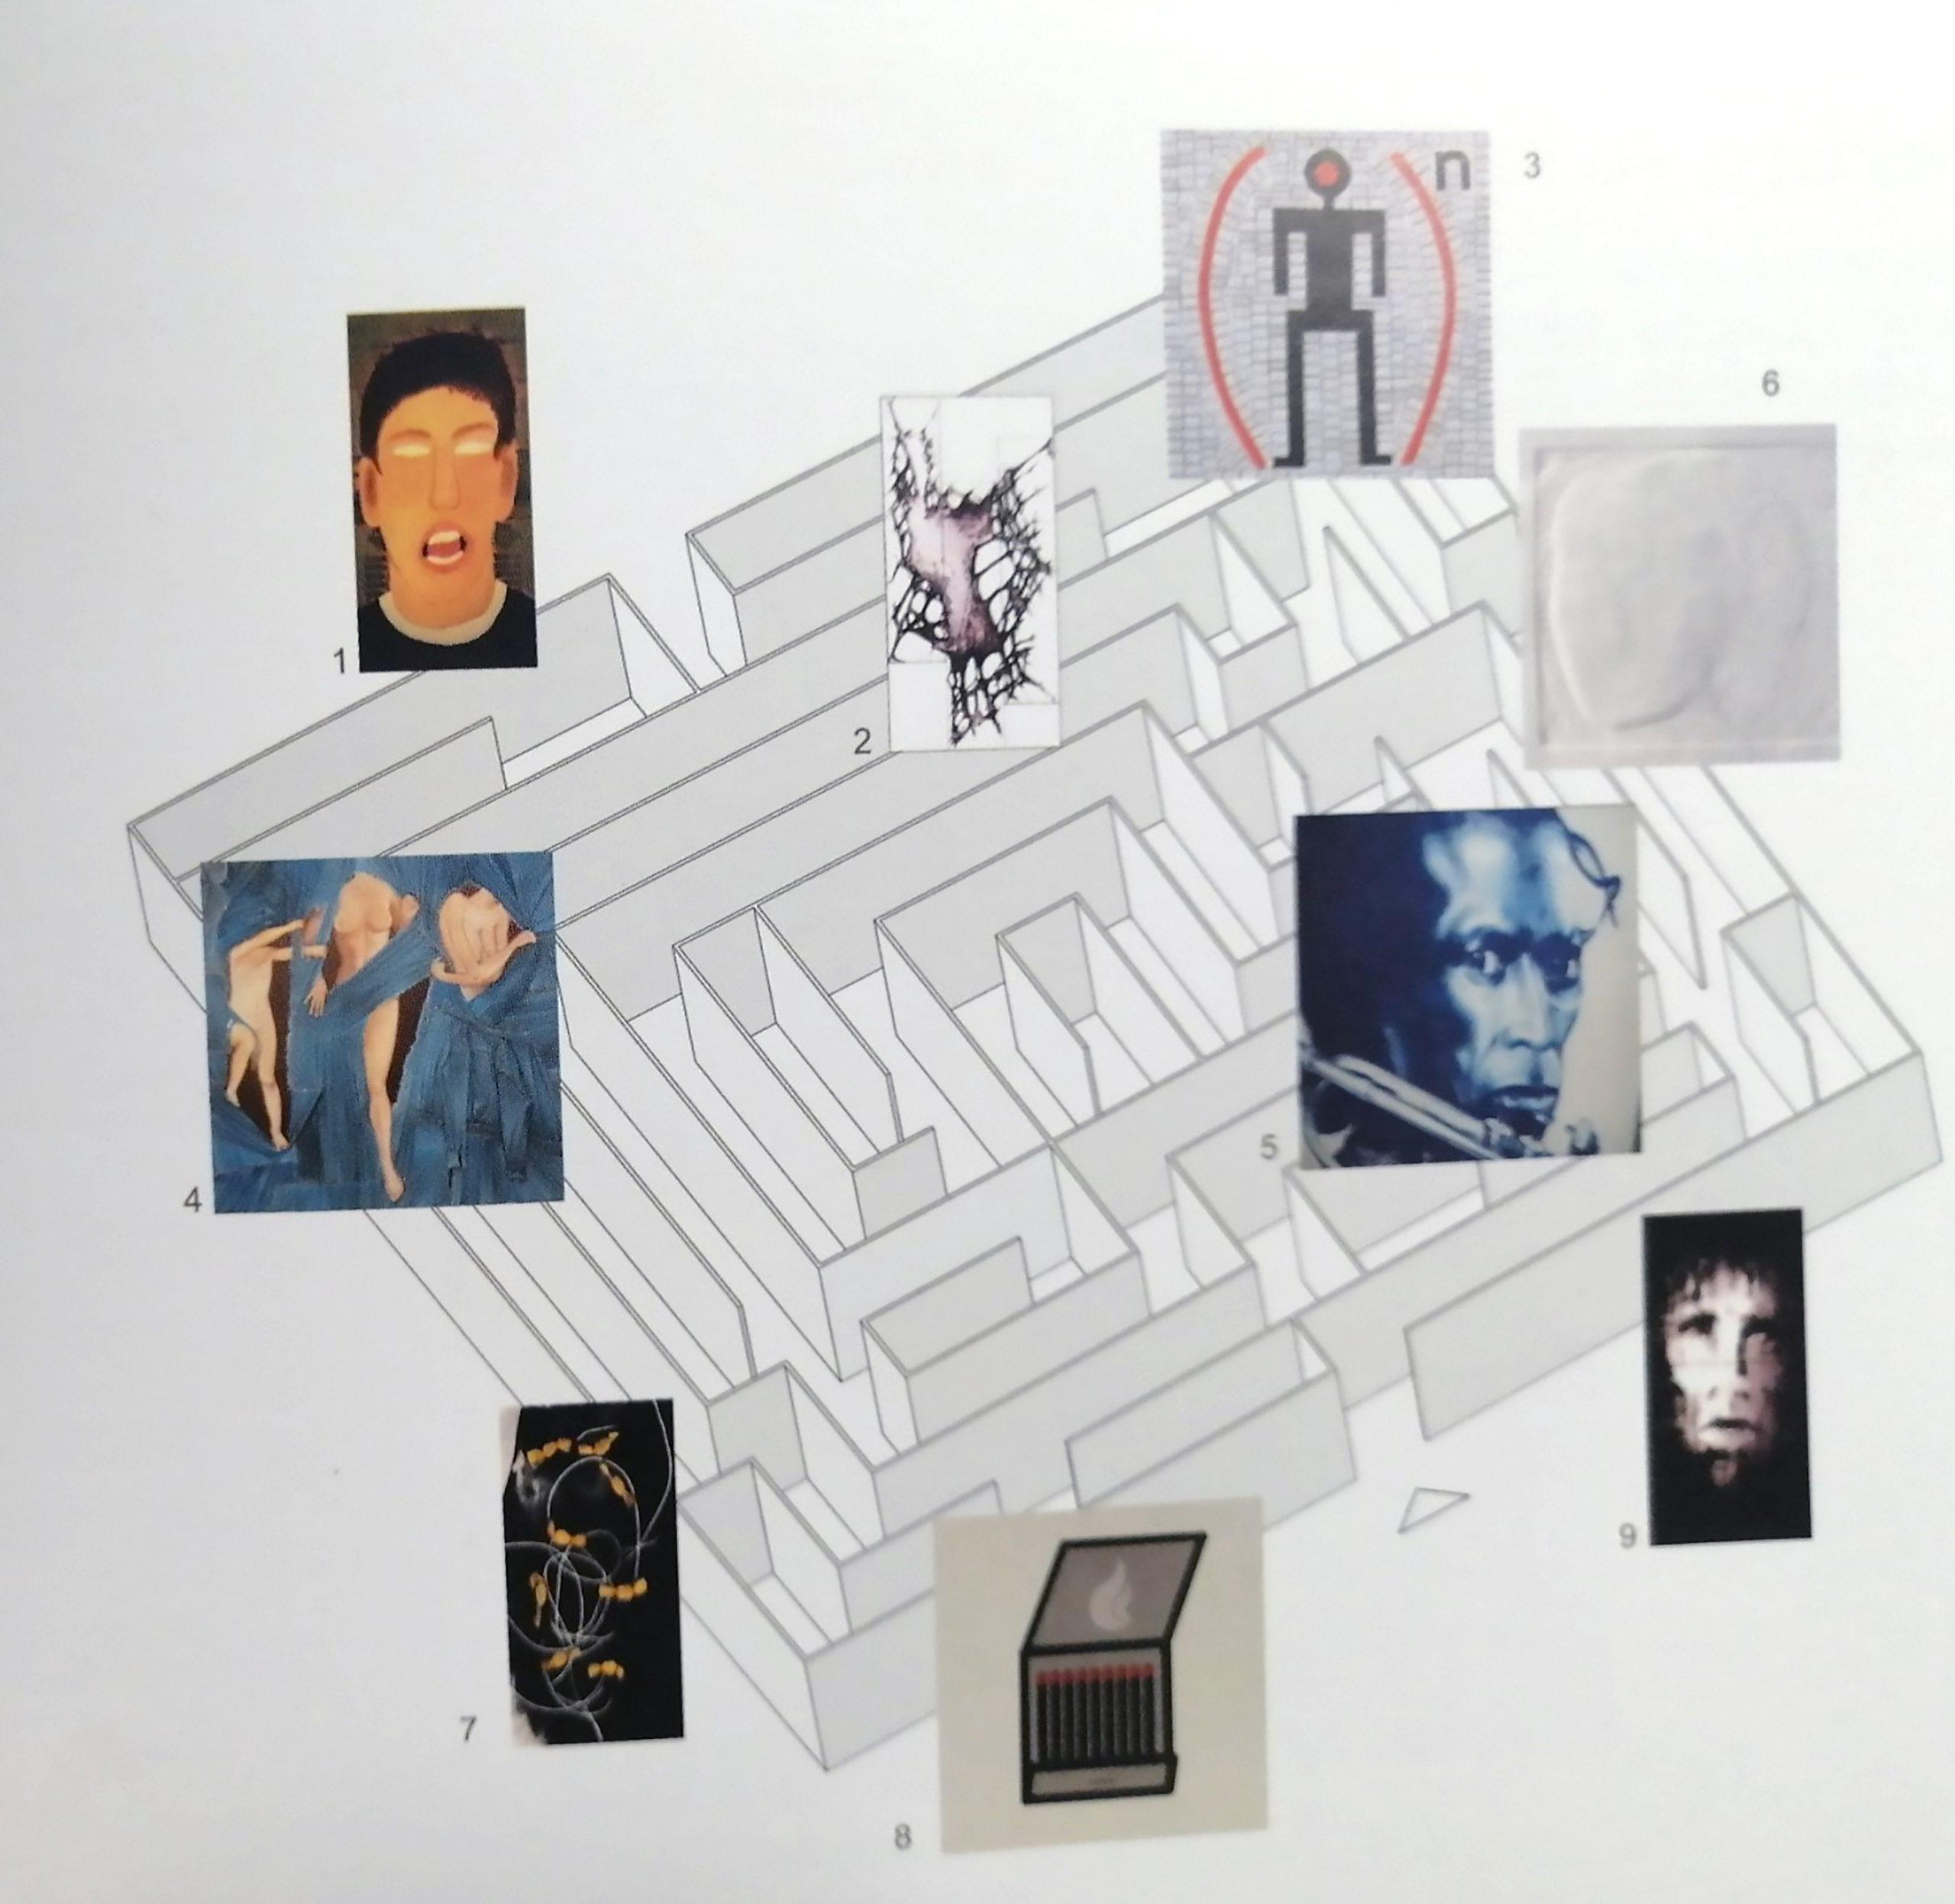 2006 Vitarte Fiera darte Viterbo imm scaled - Bibliography/ Catalogues